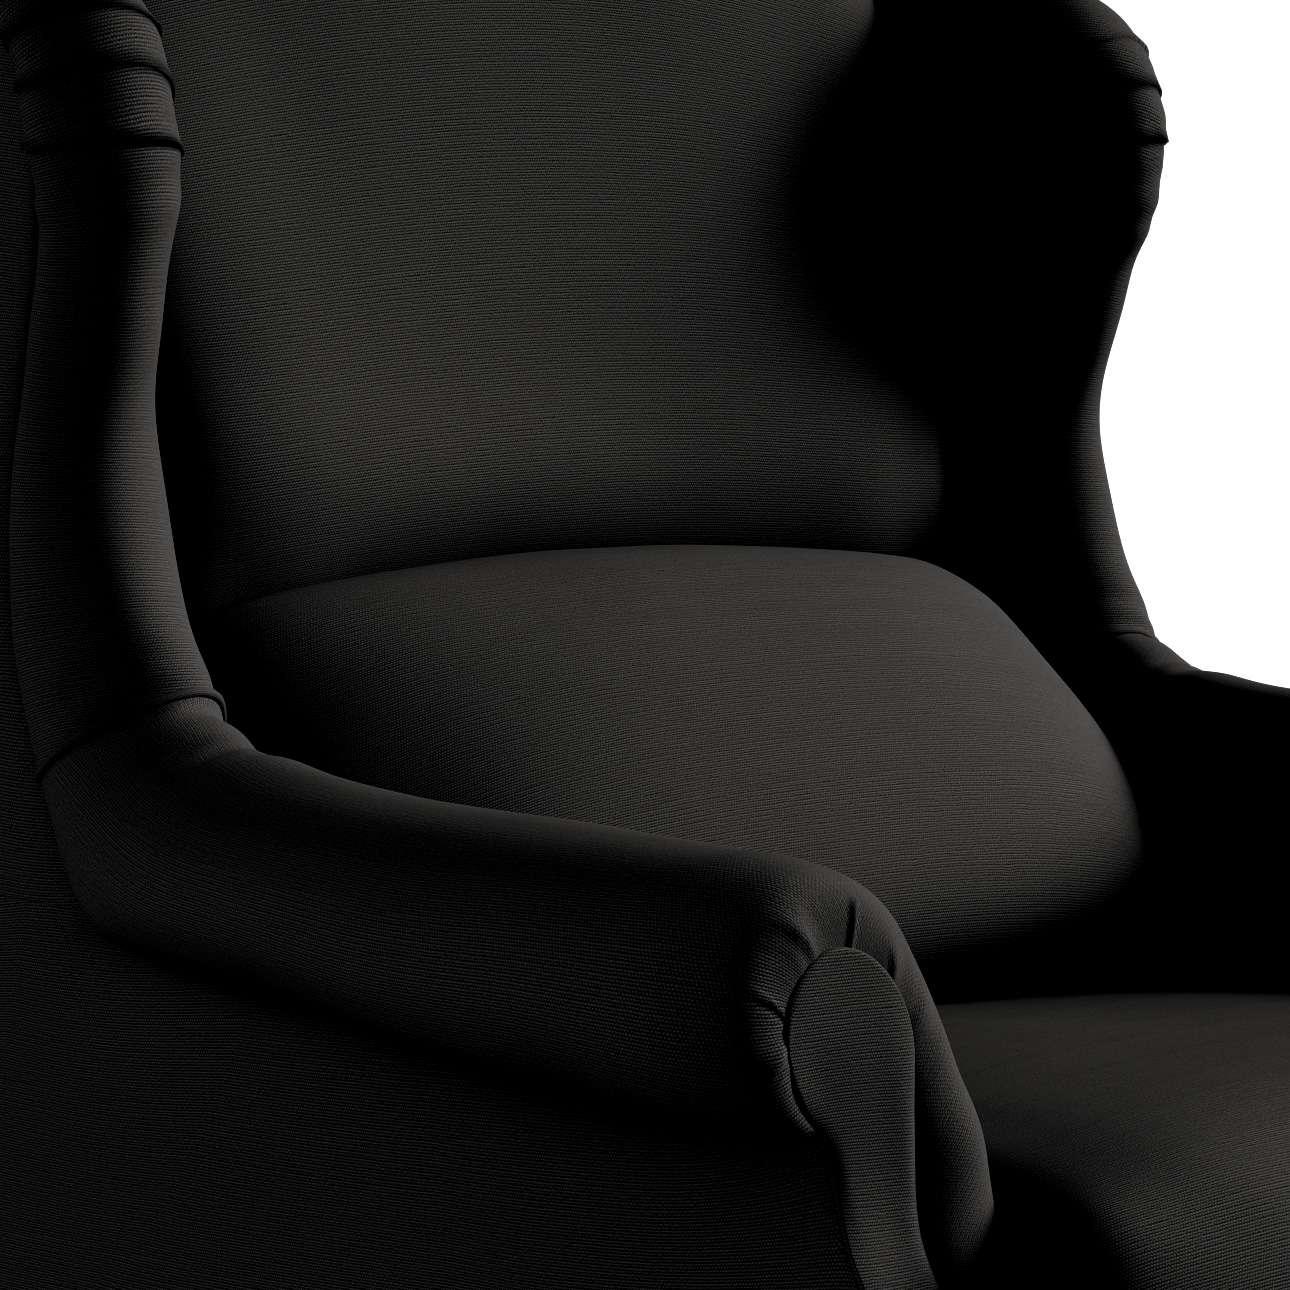 Fotel Unique w kolekcji Cotton Panama, tkanina: 702-08